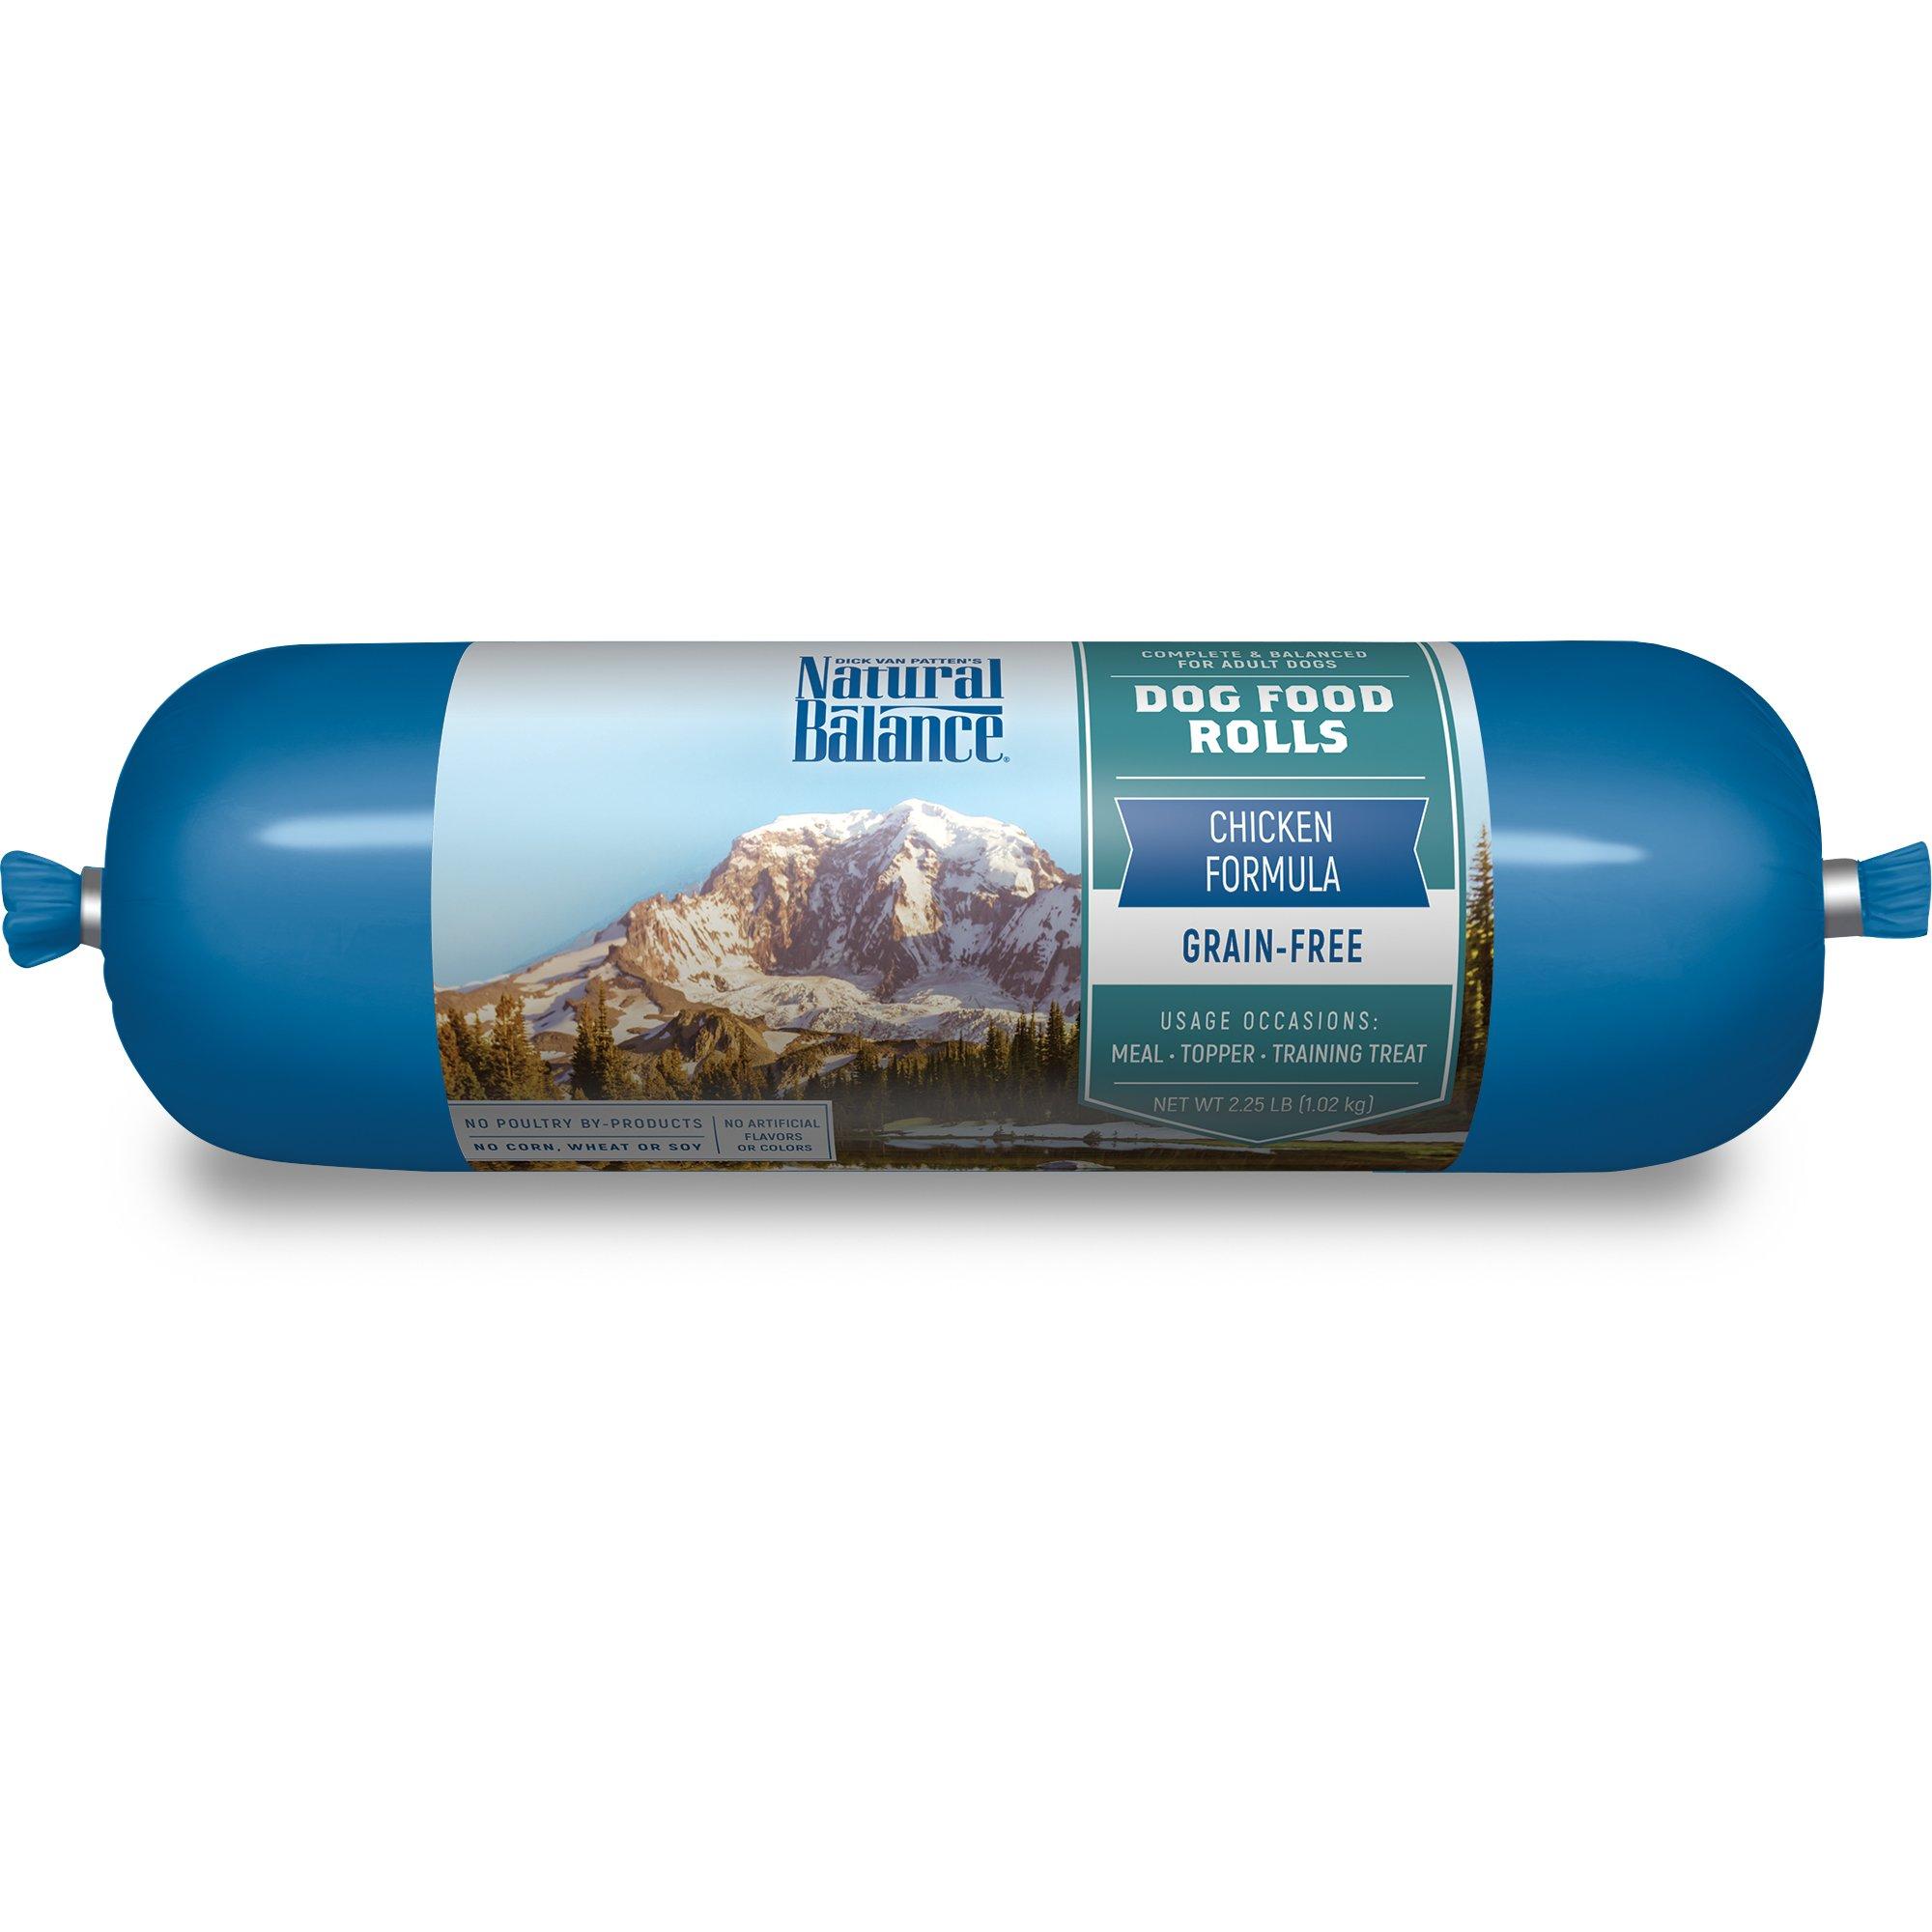 Natural Balance Chicken Formula Dog Food Roll, 2.25 lb